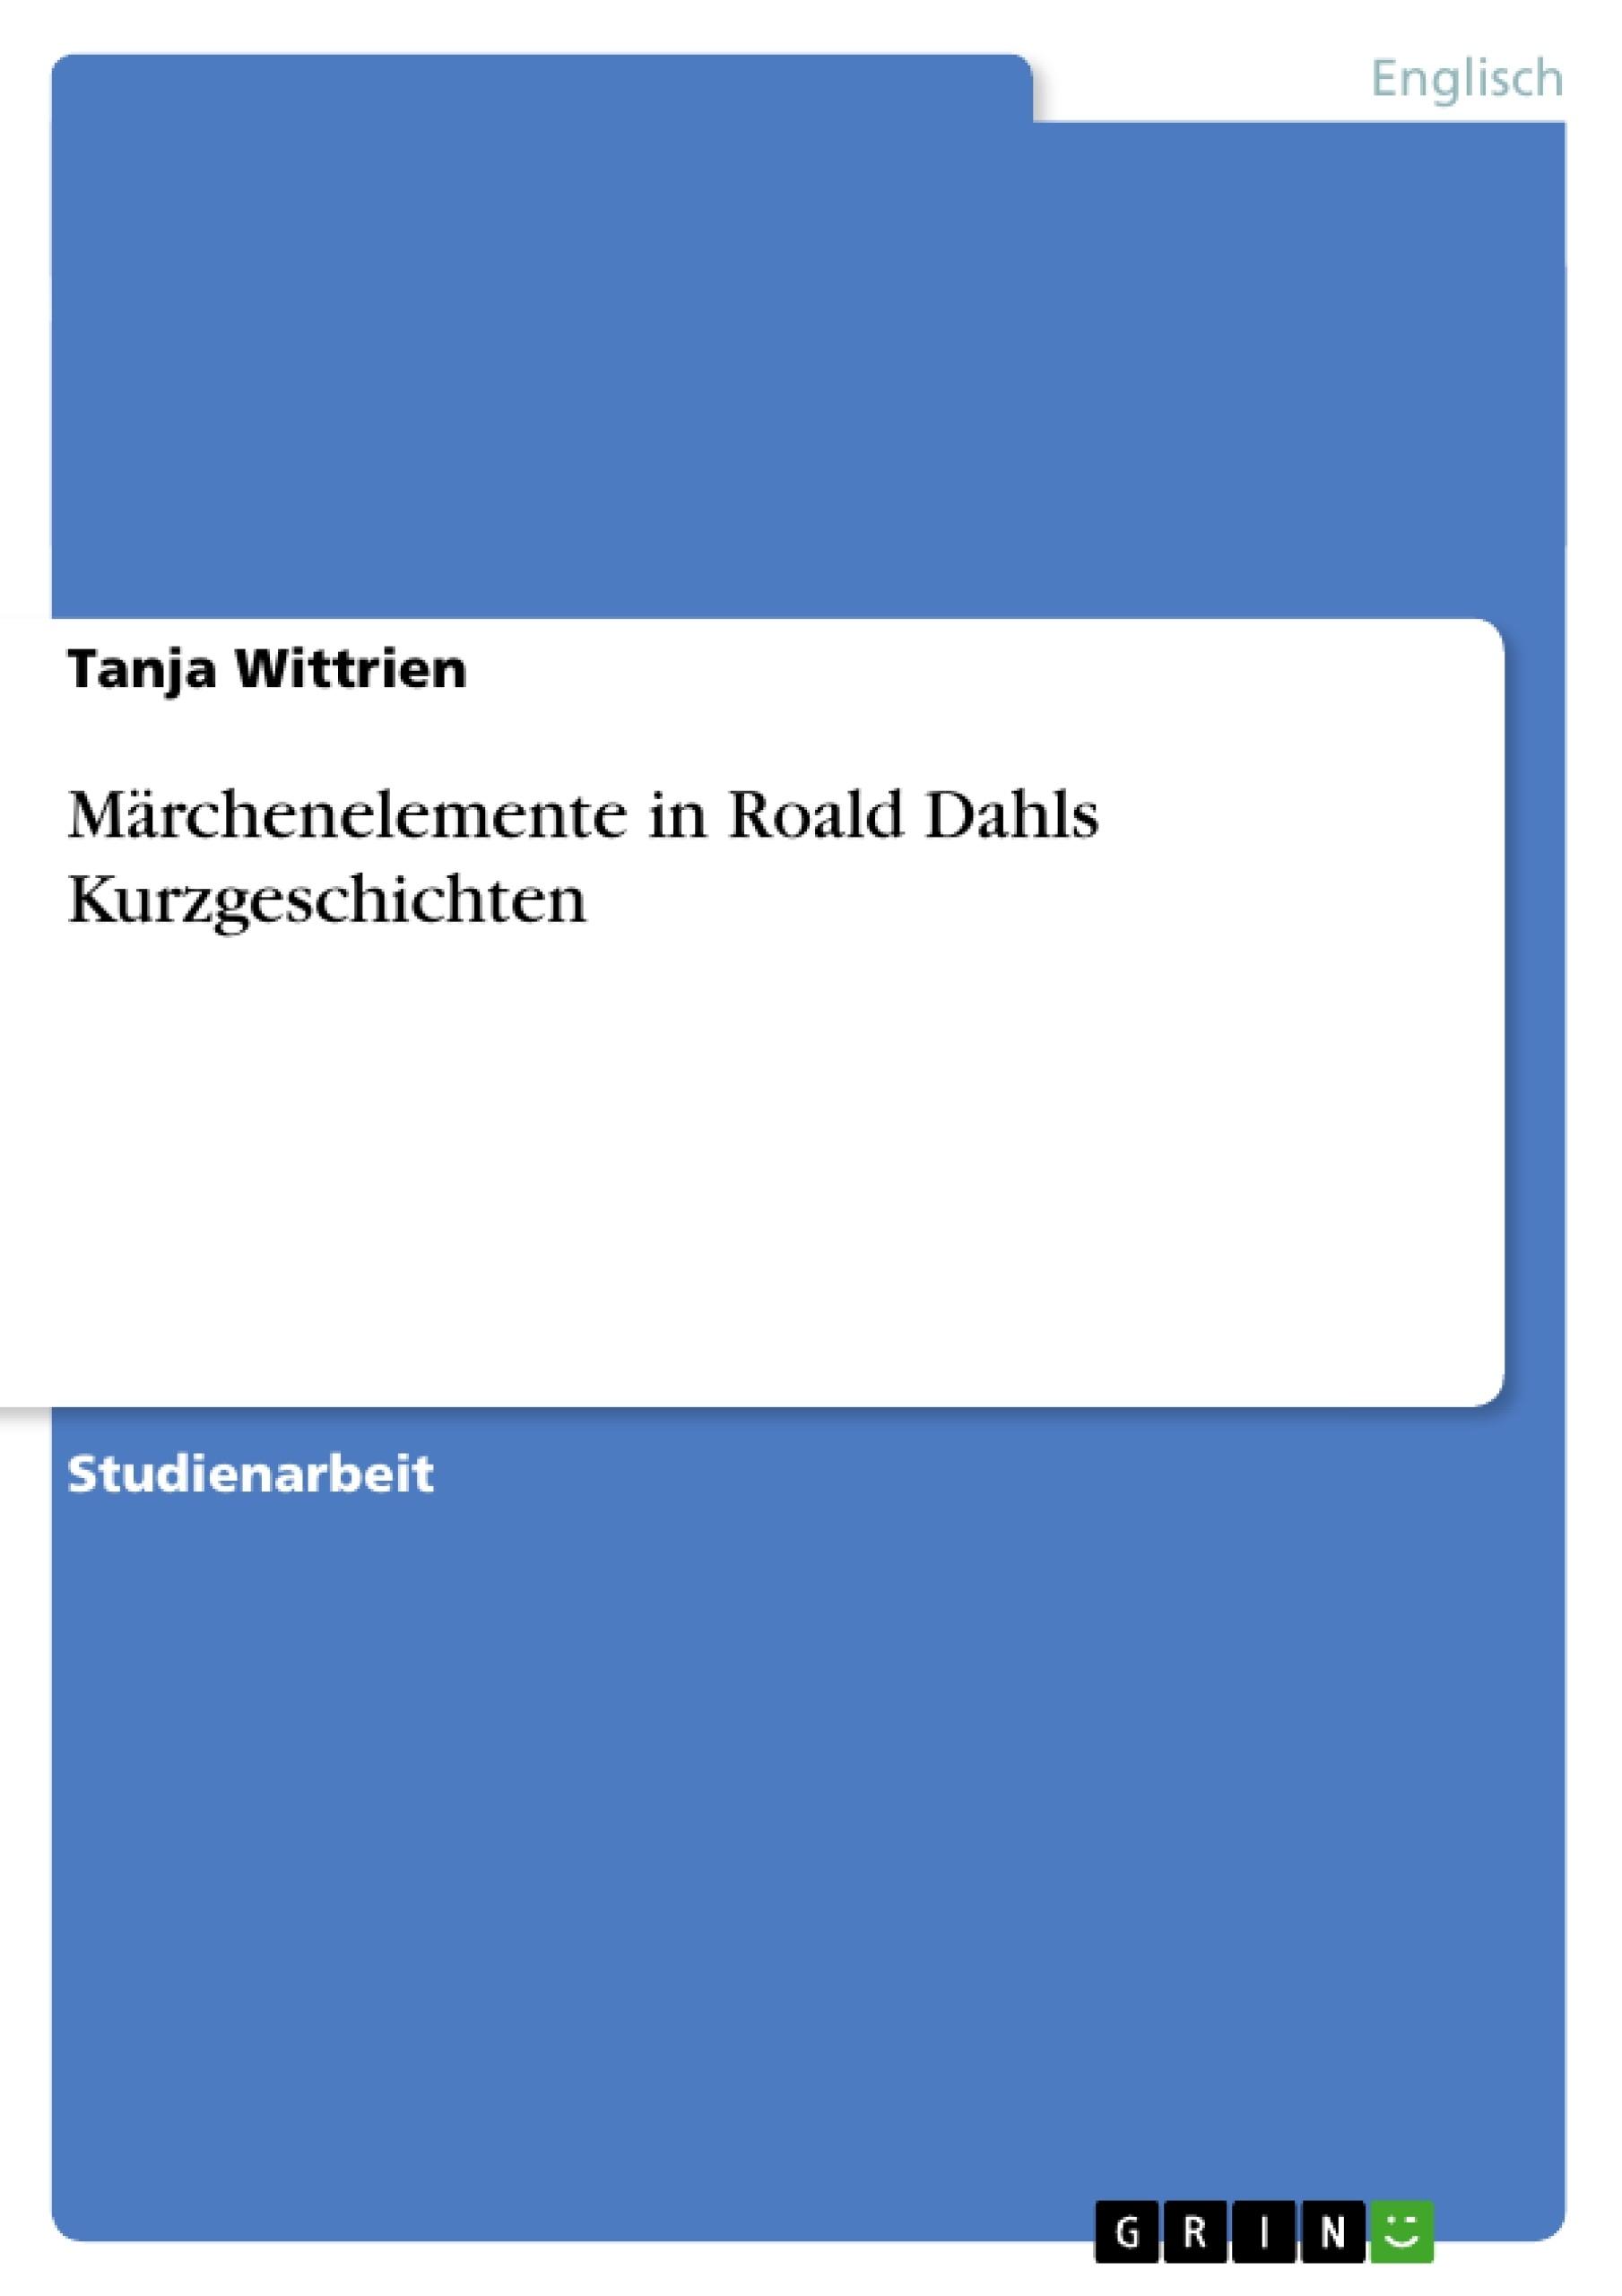 Titel: Märchenelemente in Roald Dahls Kurzgeschichten